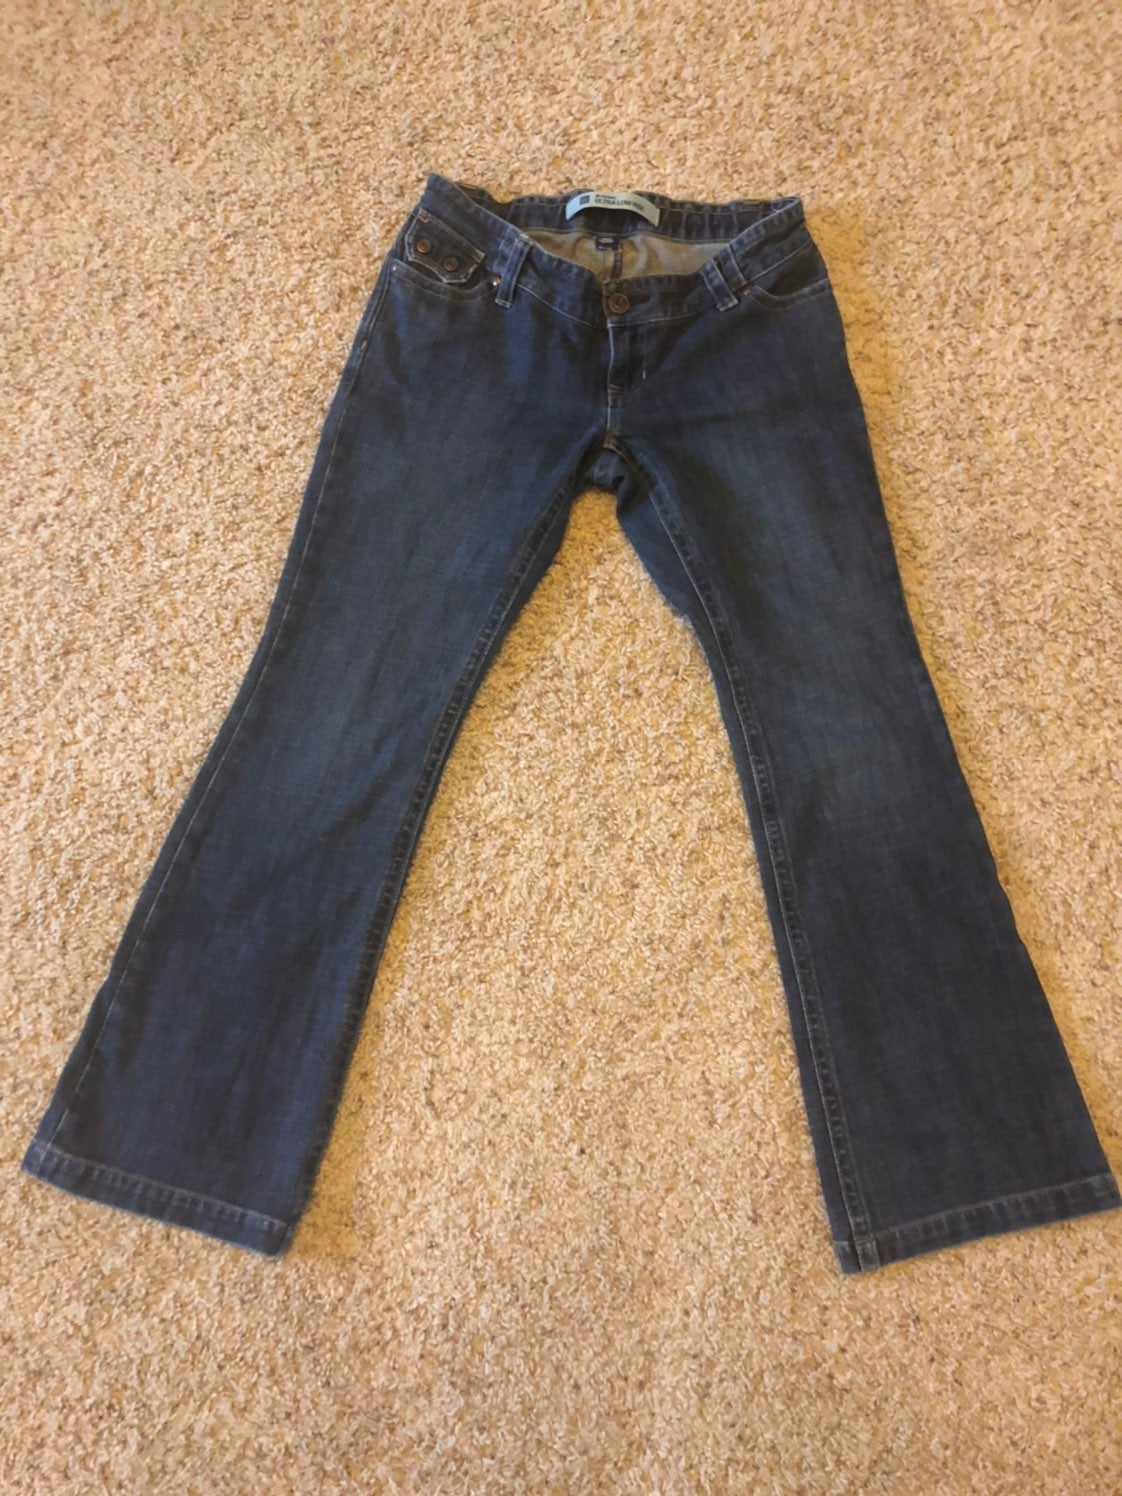 Maternity Jeans Gap ultra low rise sz 2